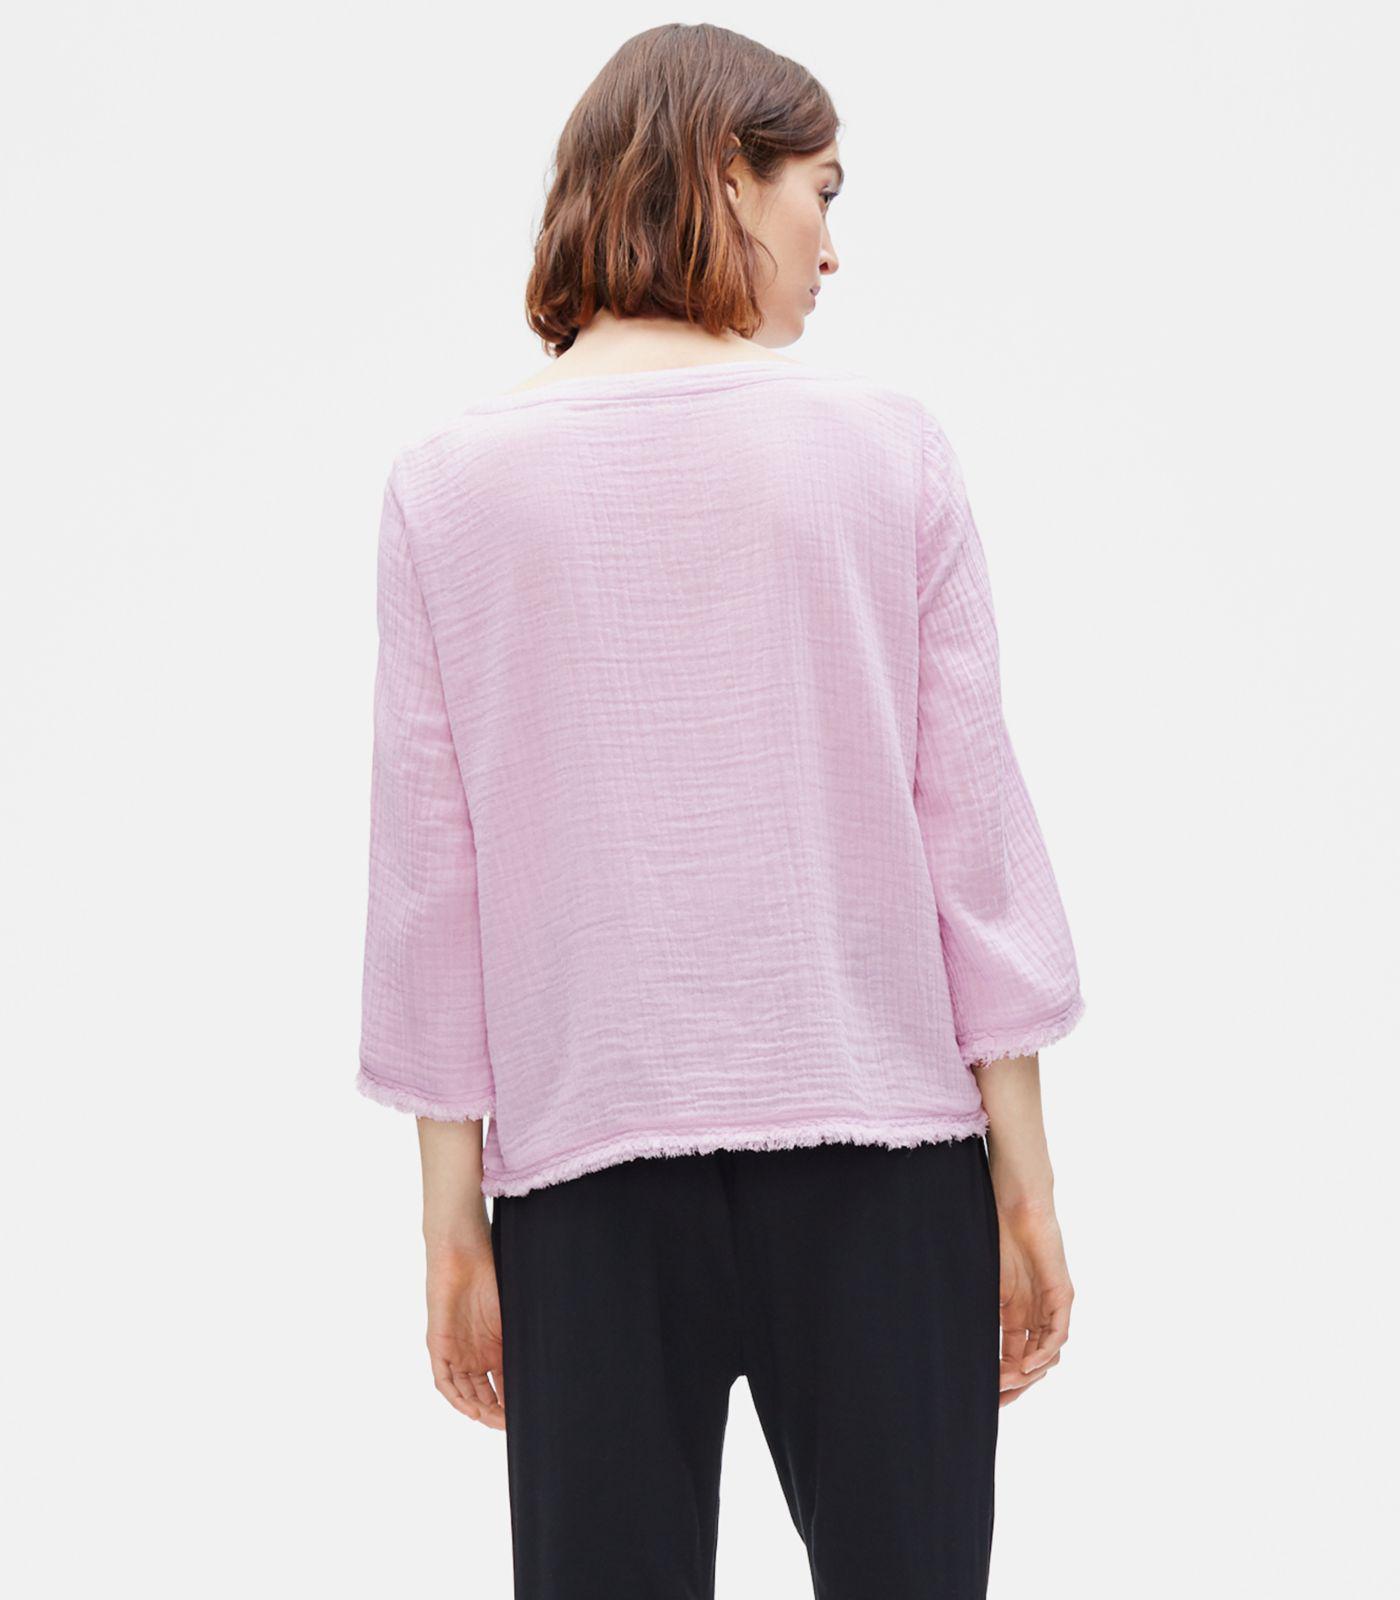 87317cfc20c826 Eileen Fisher - Multicolor Organic Cotton Lofty Gauze Box-top - Lyst. View  fullscreen